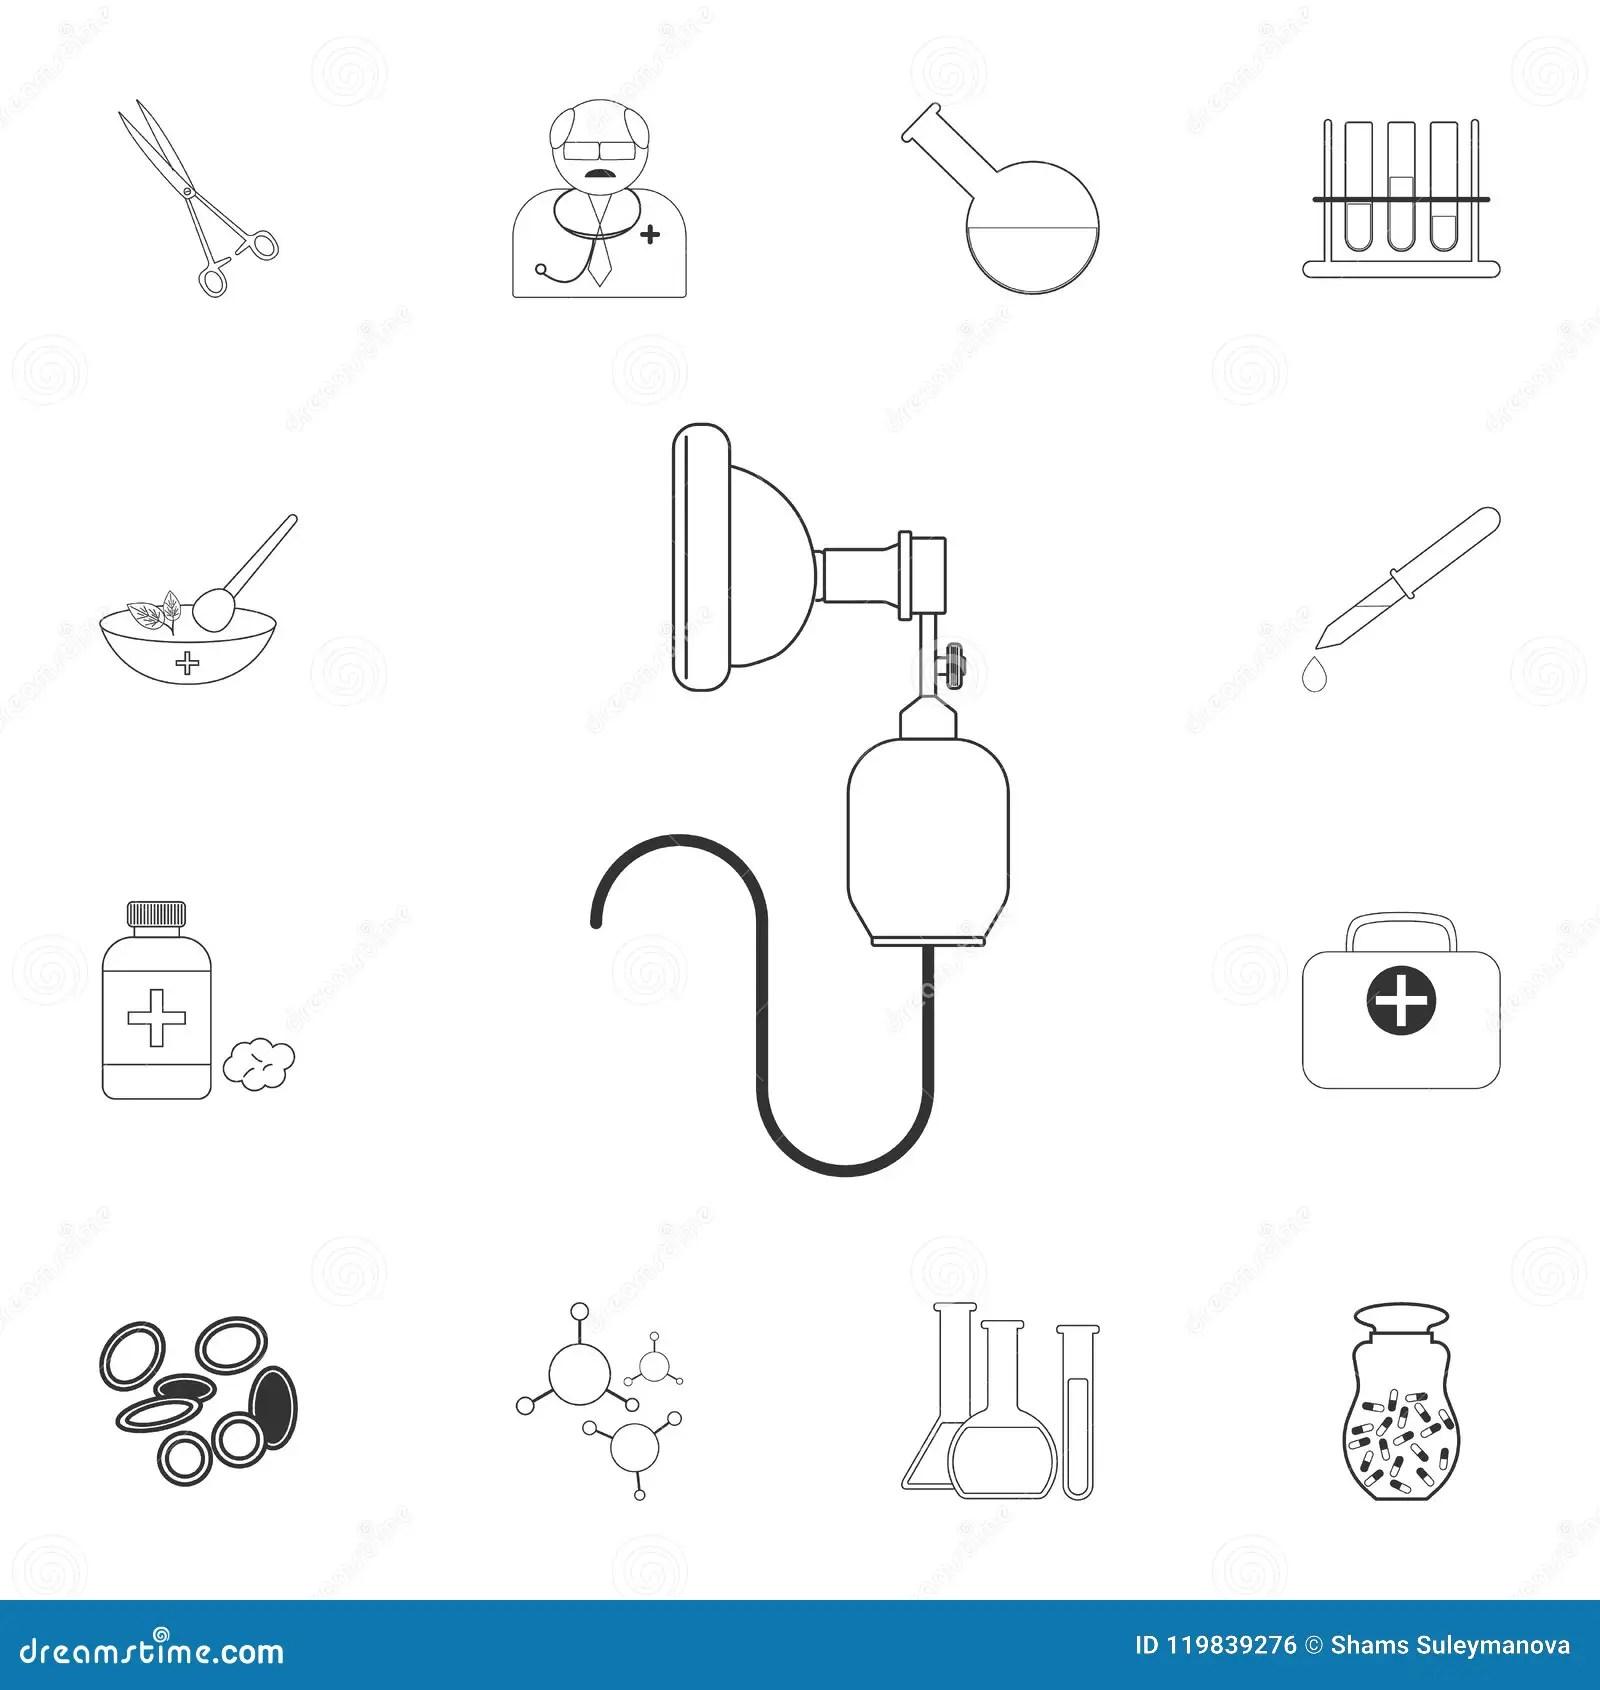 Human Diaphragm Anatomy Royalty Free Stock Photo